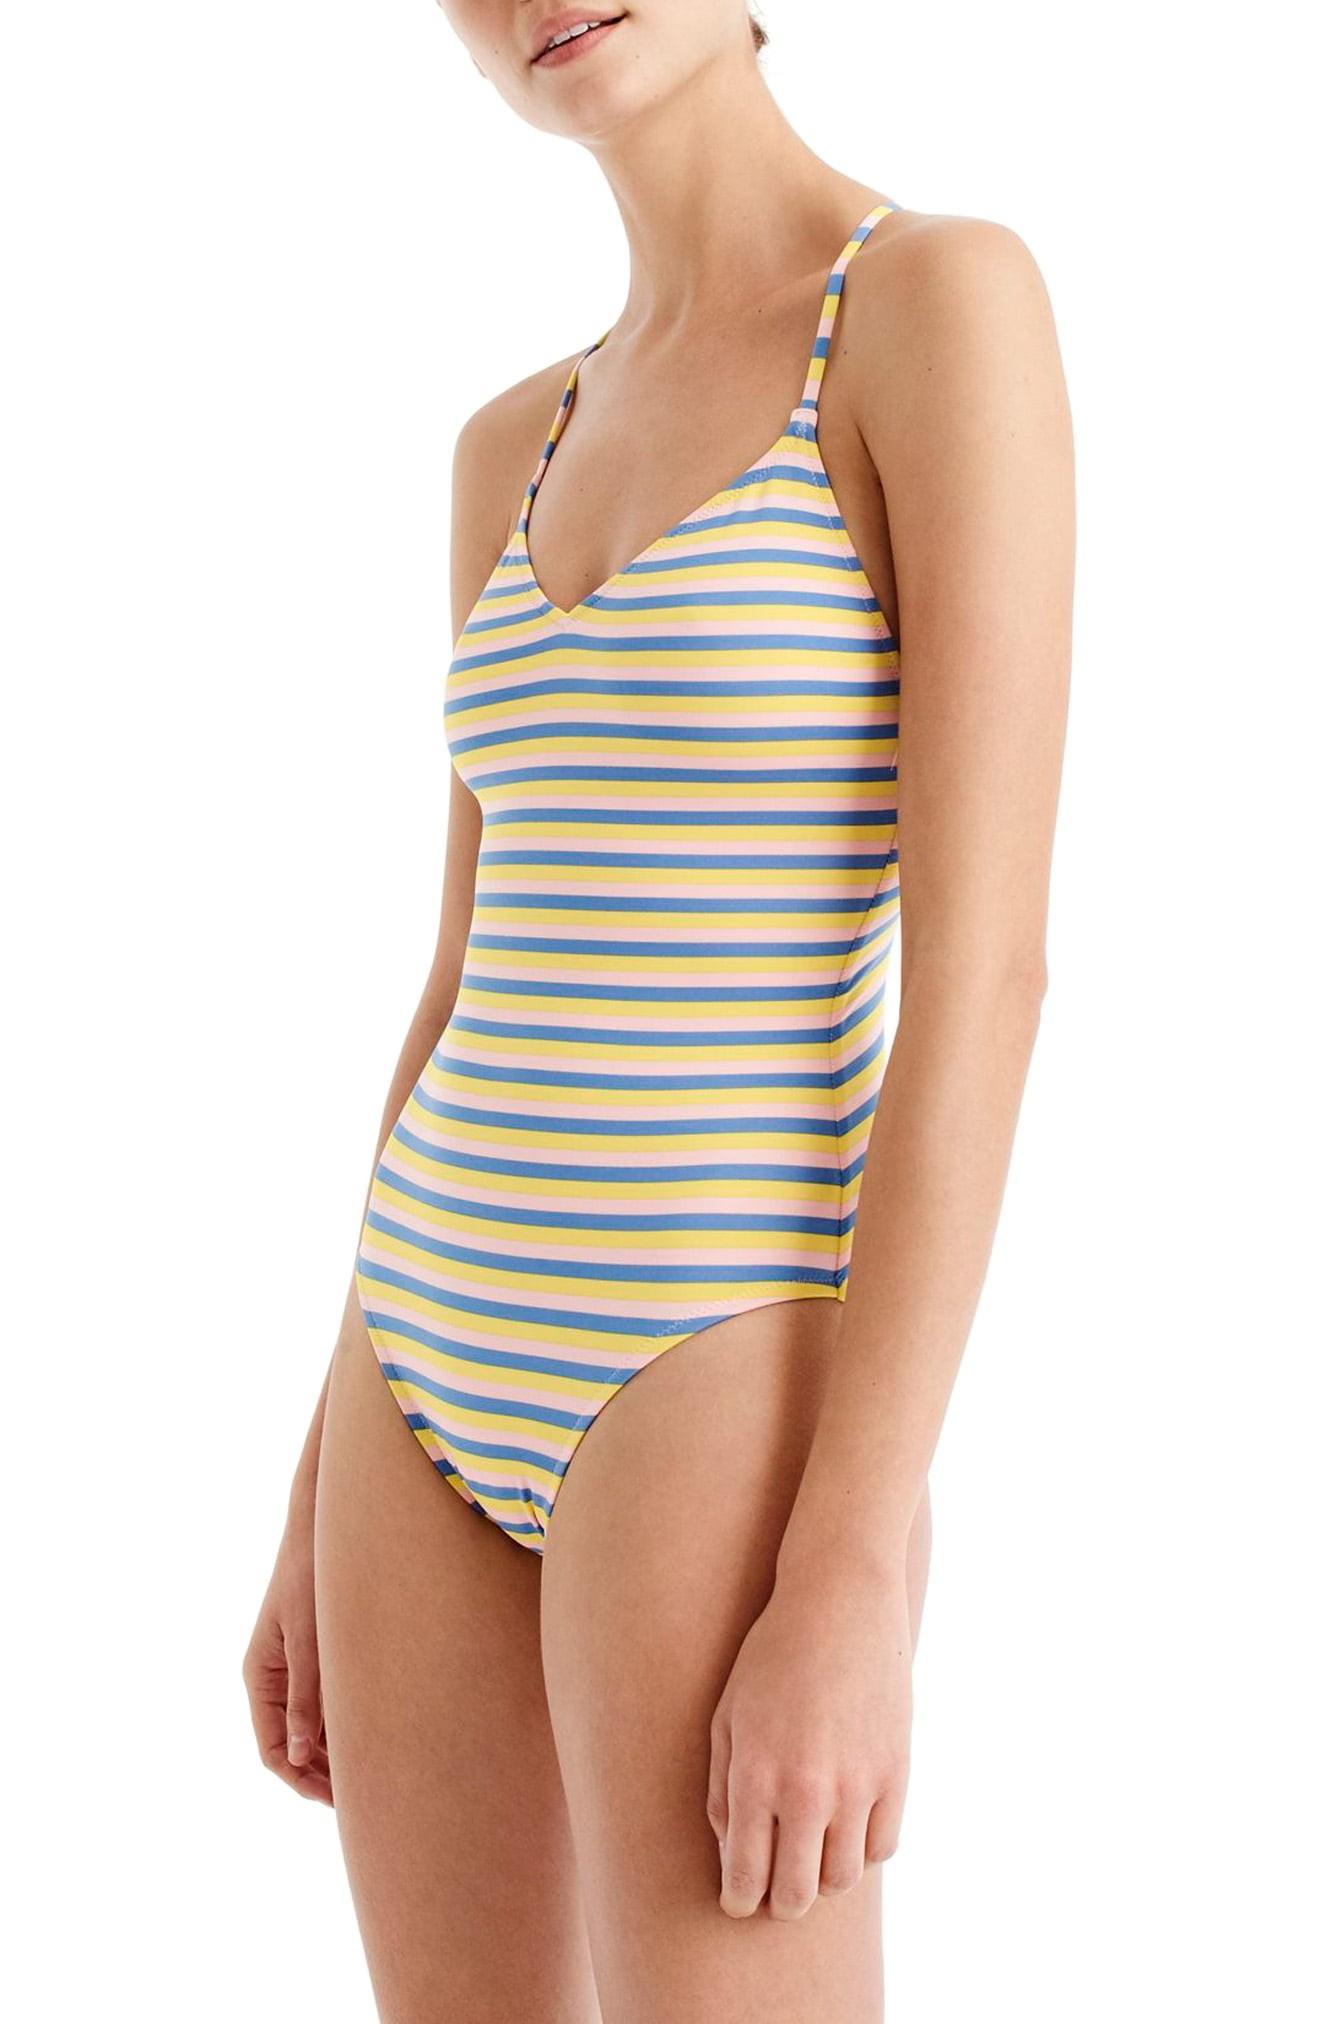 ca4e611d04a91 9 Cute One-Piece Swimsuits for Summer | Jess Ann Kirby